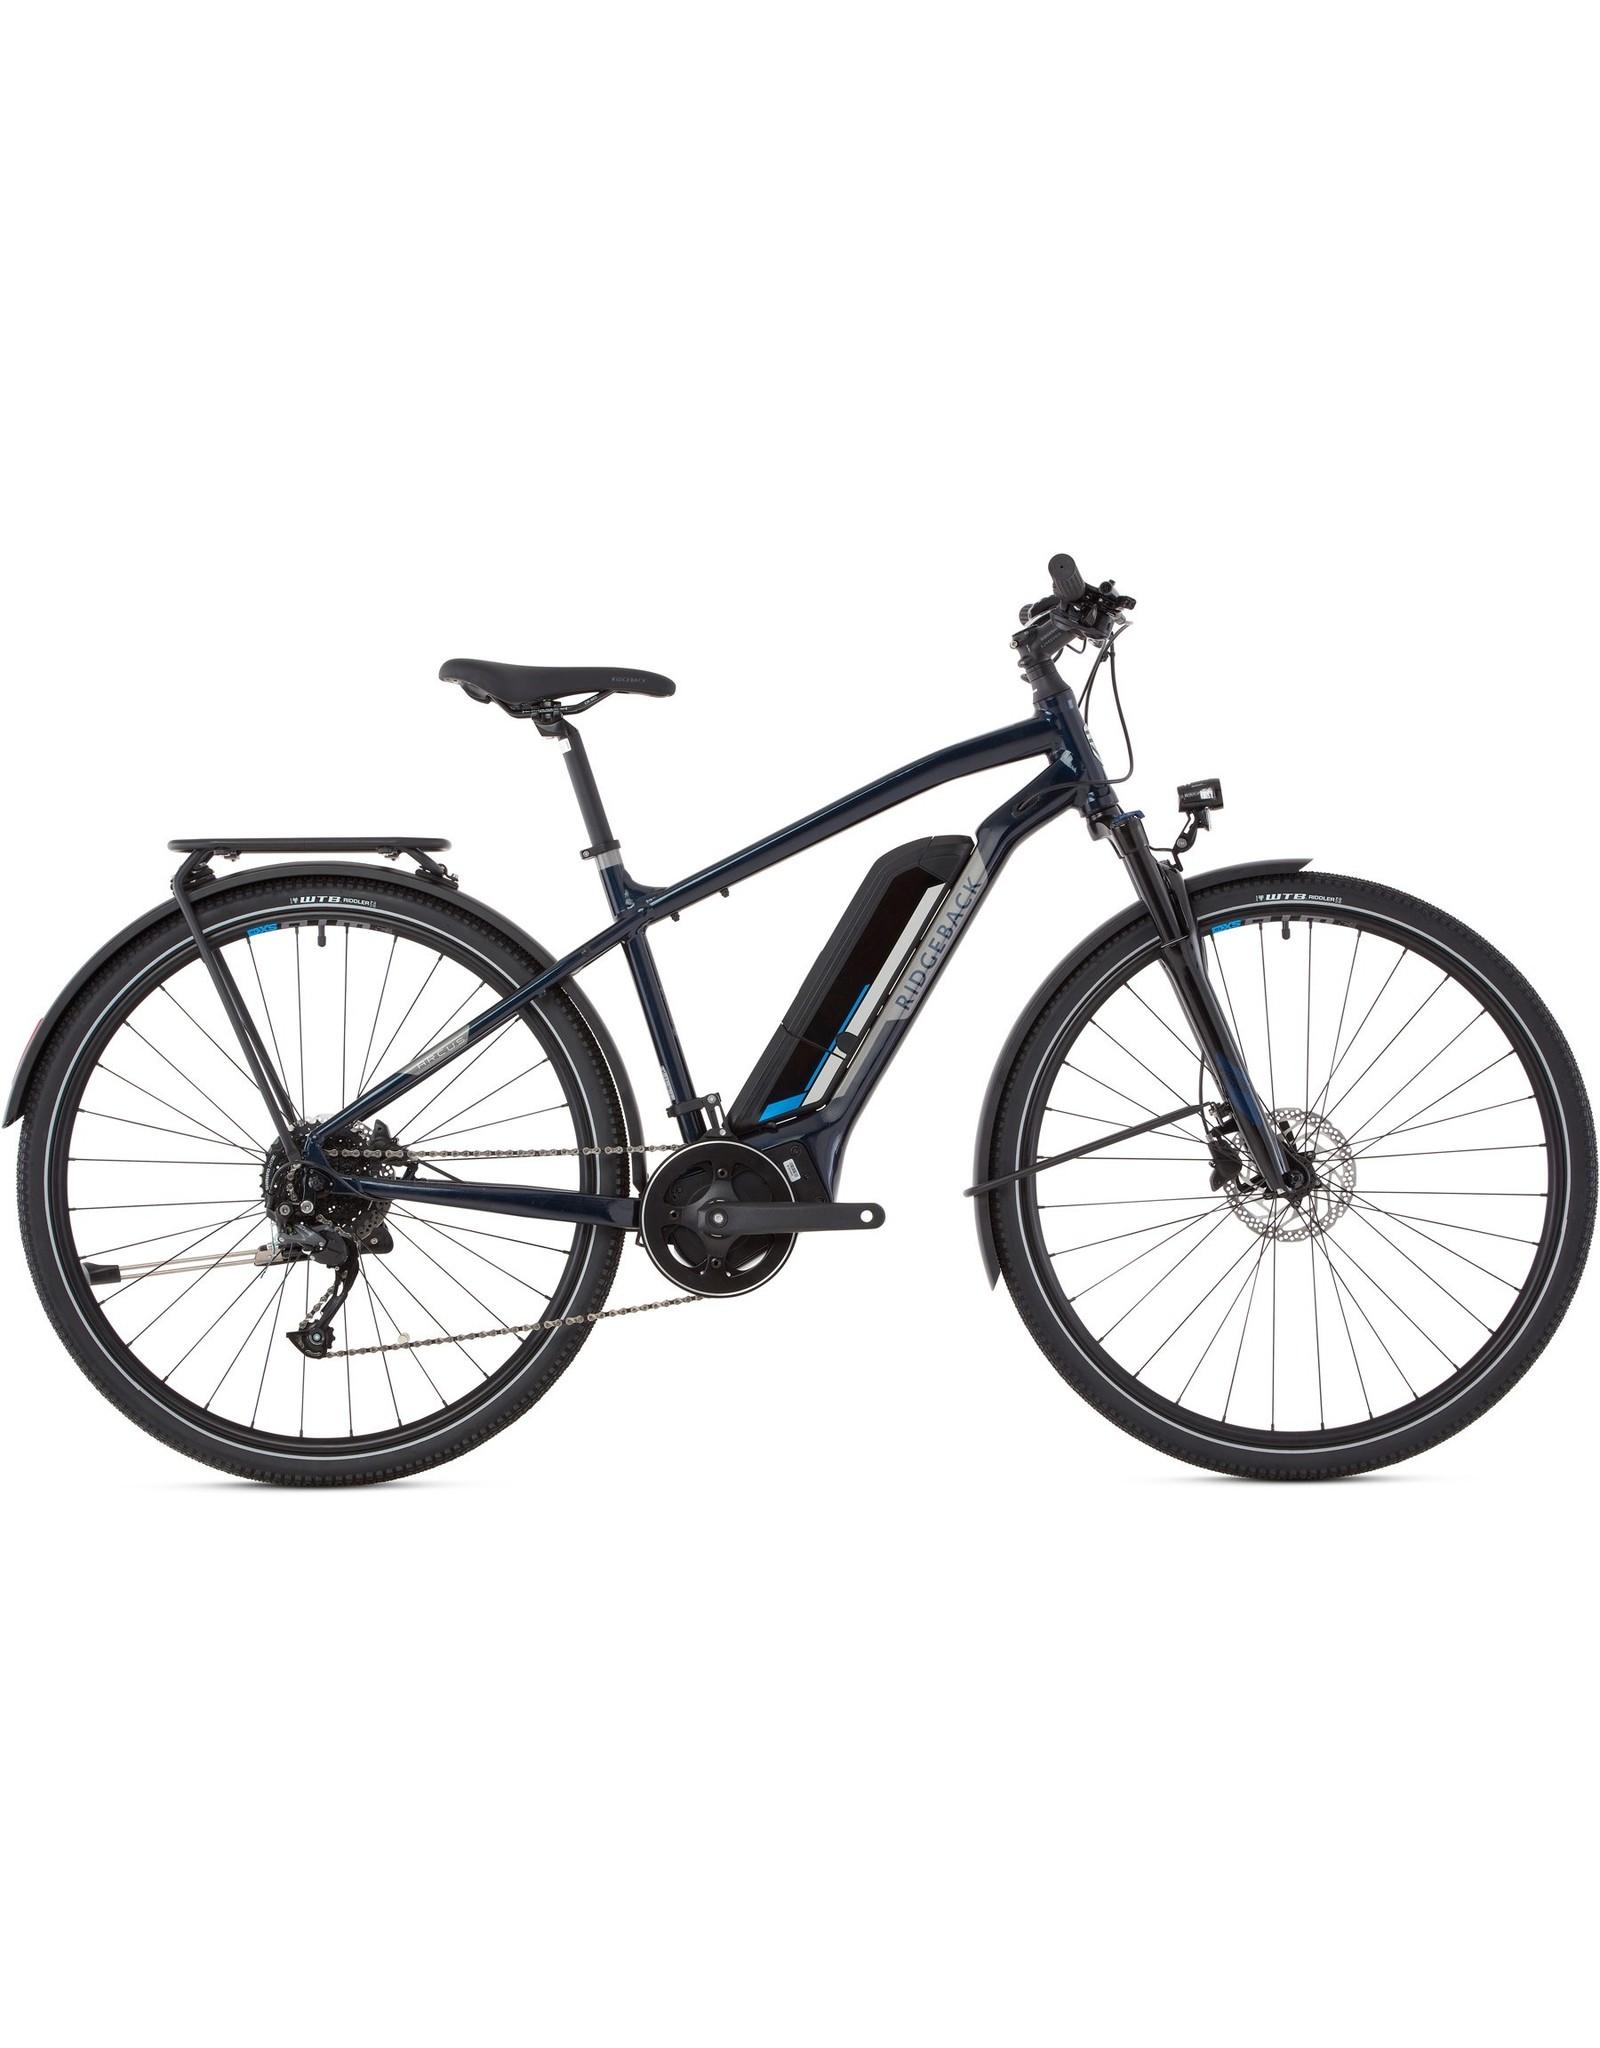 Ridgeback 2021 Ridgeback Arcus 2 Electric Bike in Blue